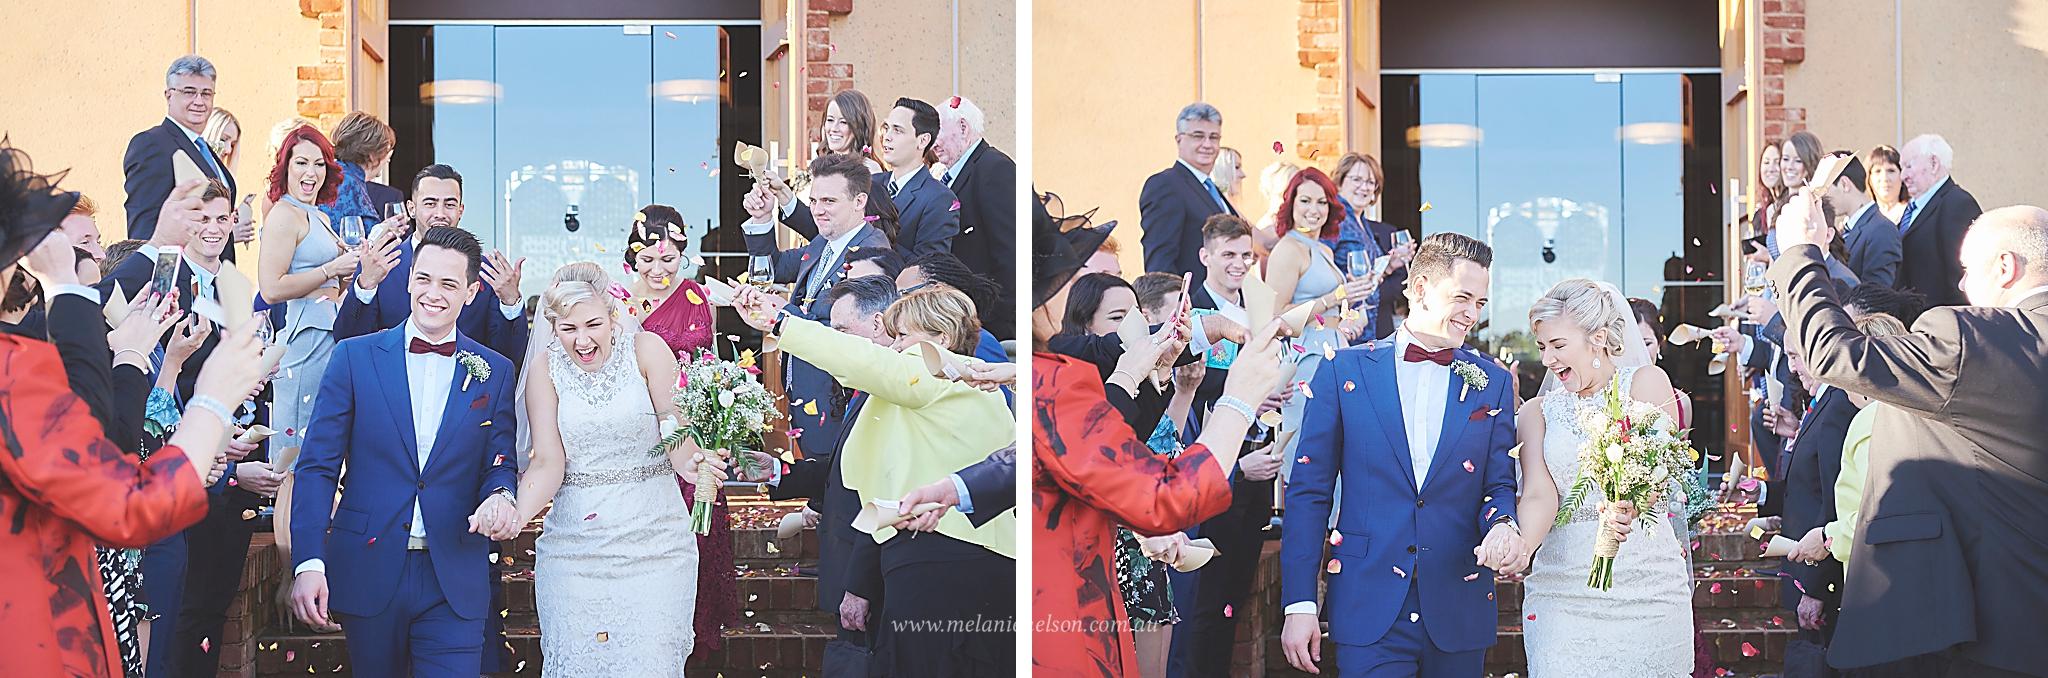 barossa_wedding_photography_0026.jpg